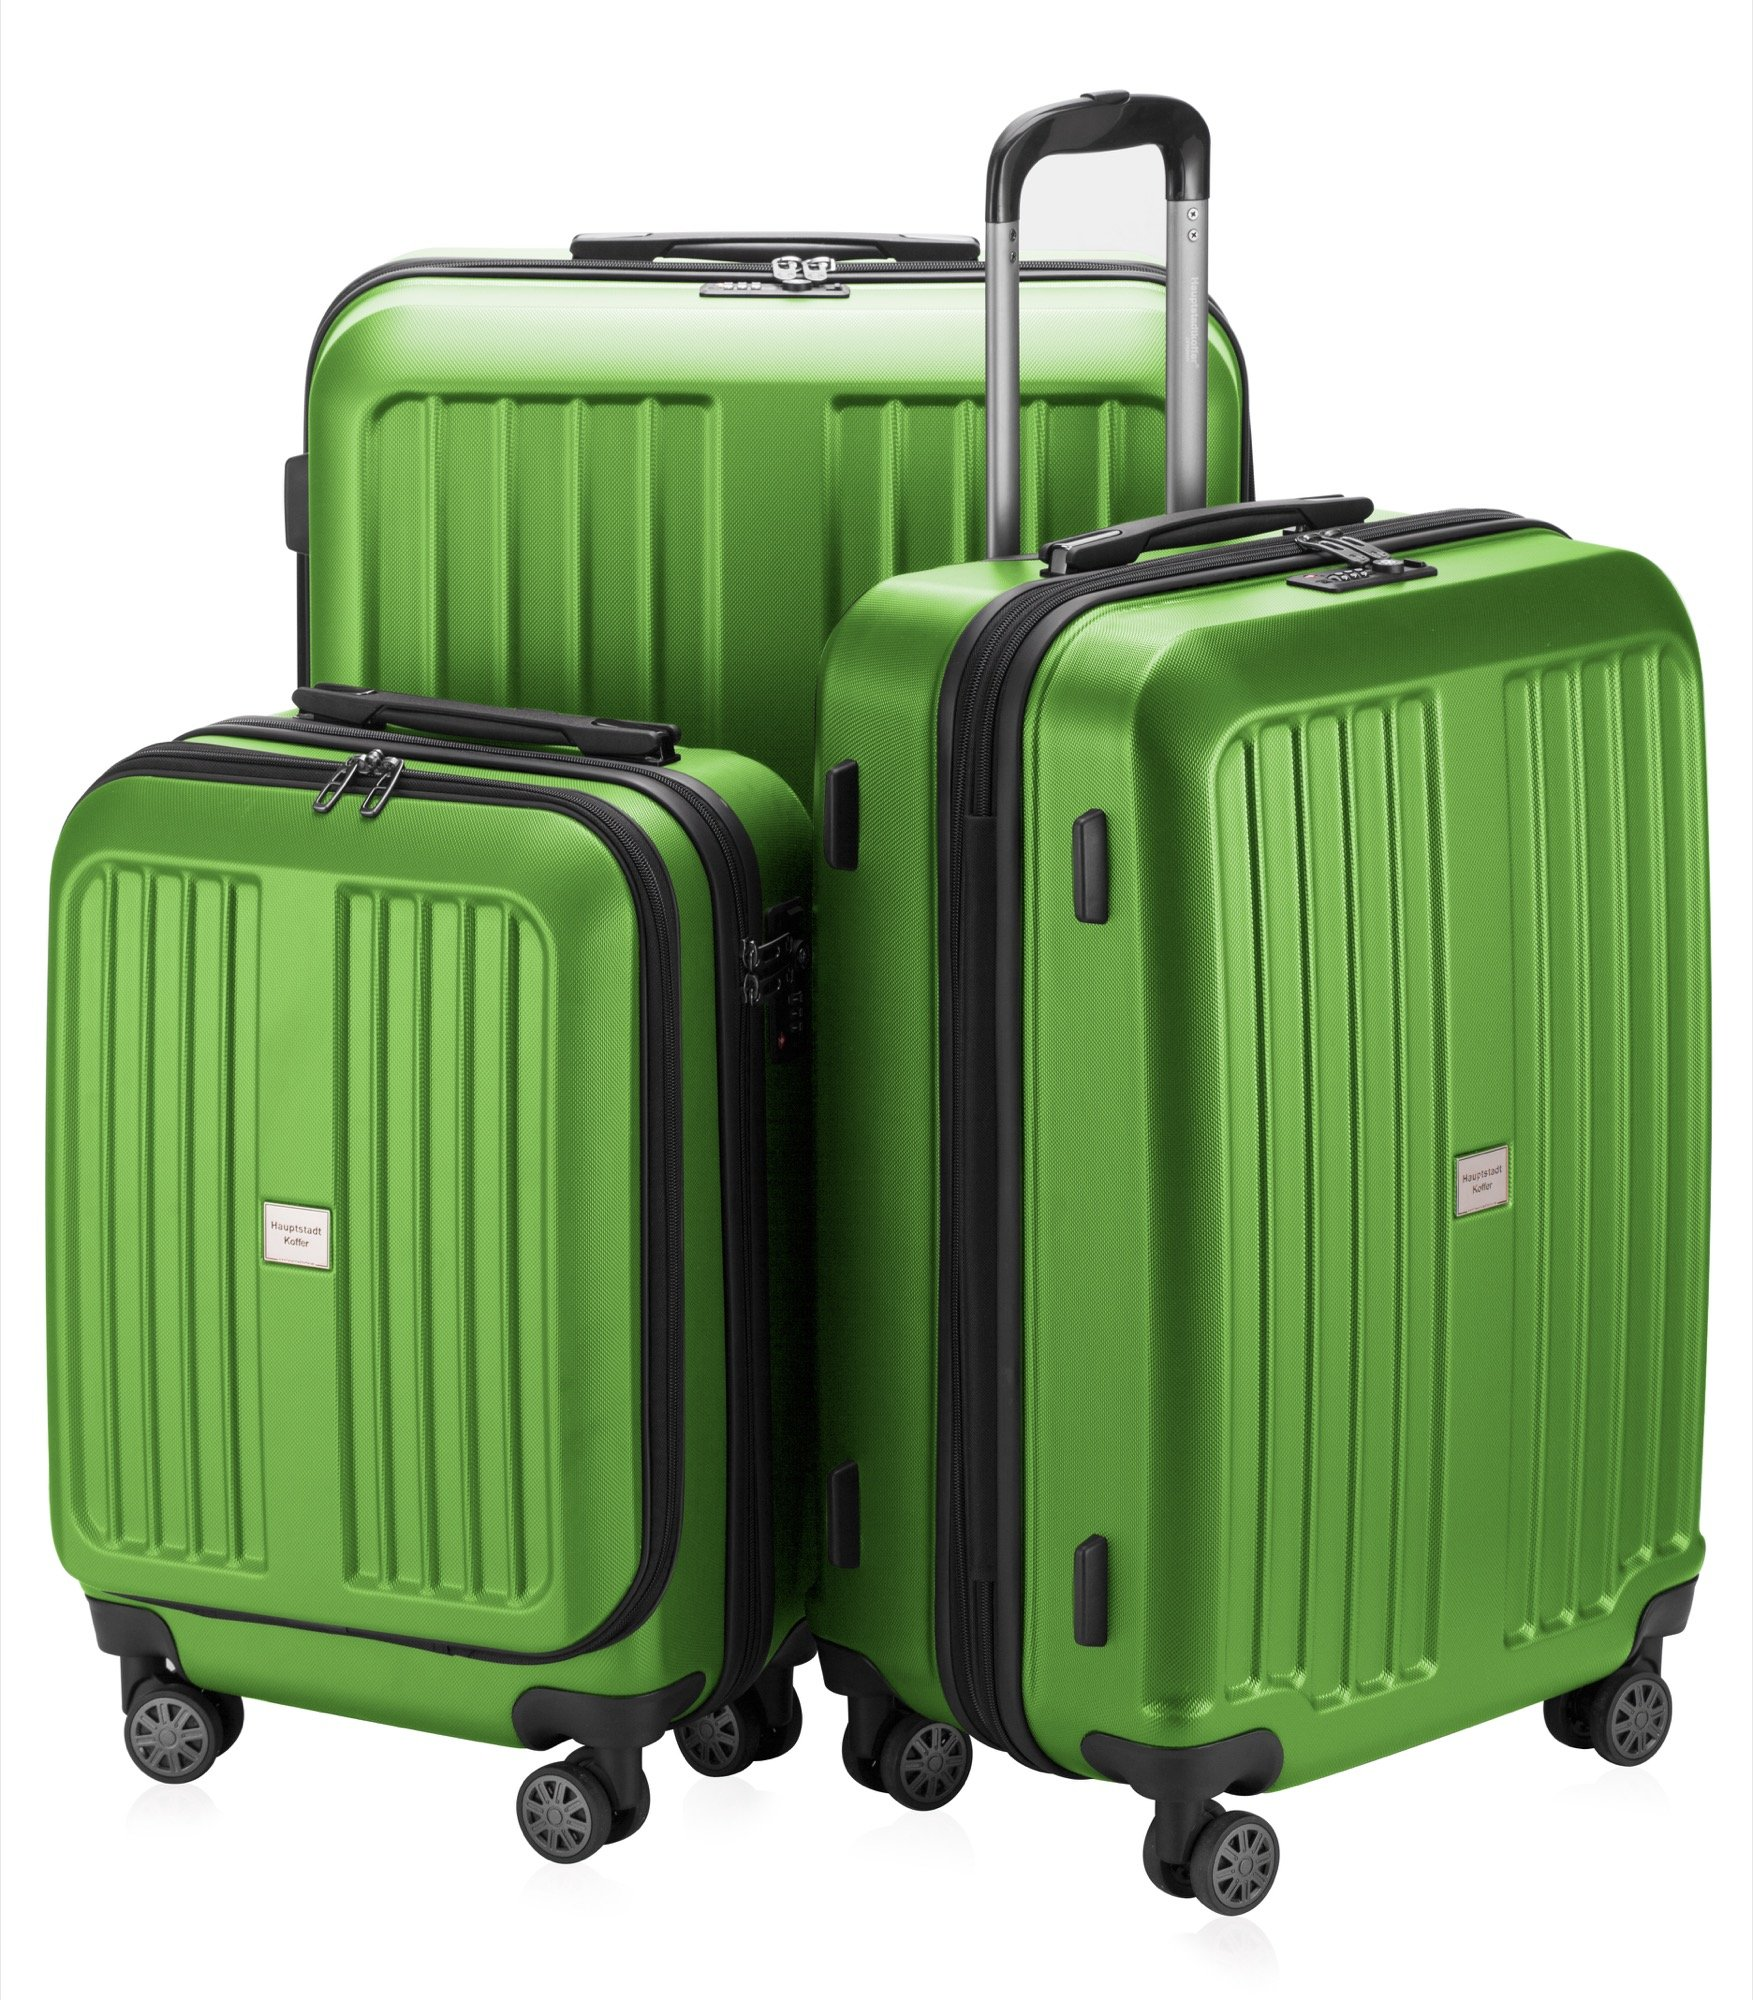 HAUPTSTADTKOFFER X-Berg - Set of 3 Hard-side Luggages matt Suitcase Hardside Spinner Trolley Expandable (20¡°, 24¡° & 28¡°) TSA Applegreen by Hauptstadtkoffer